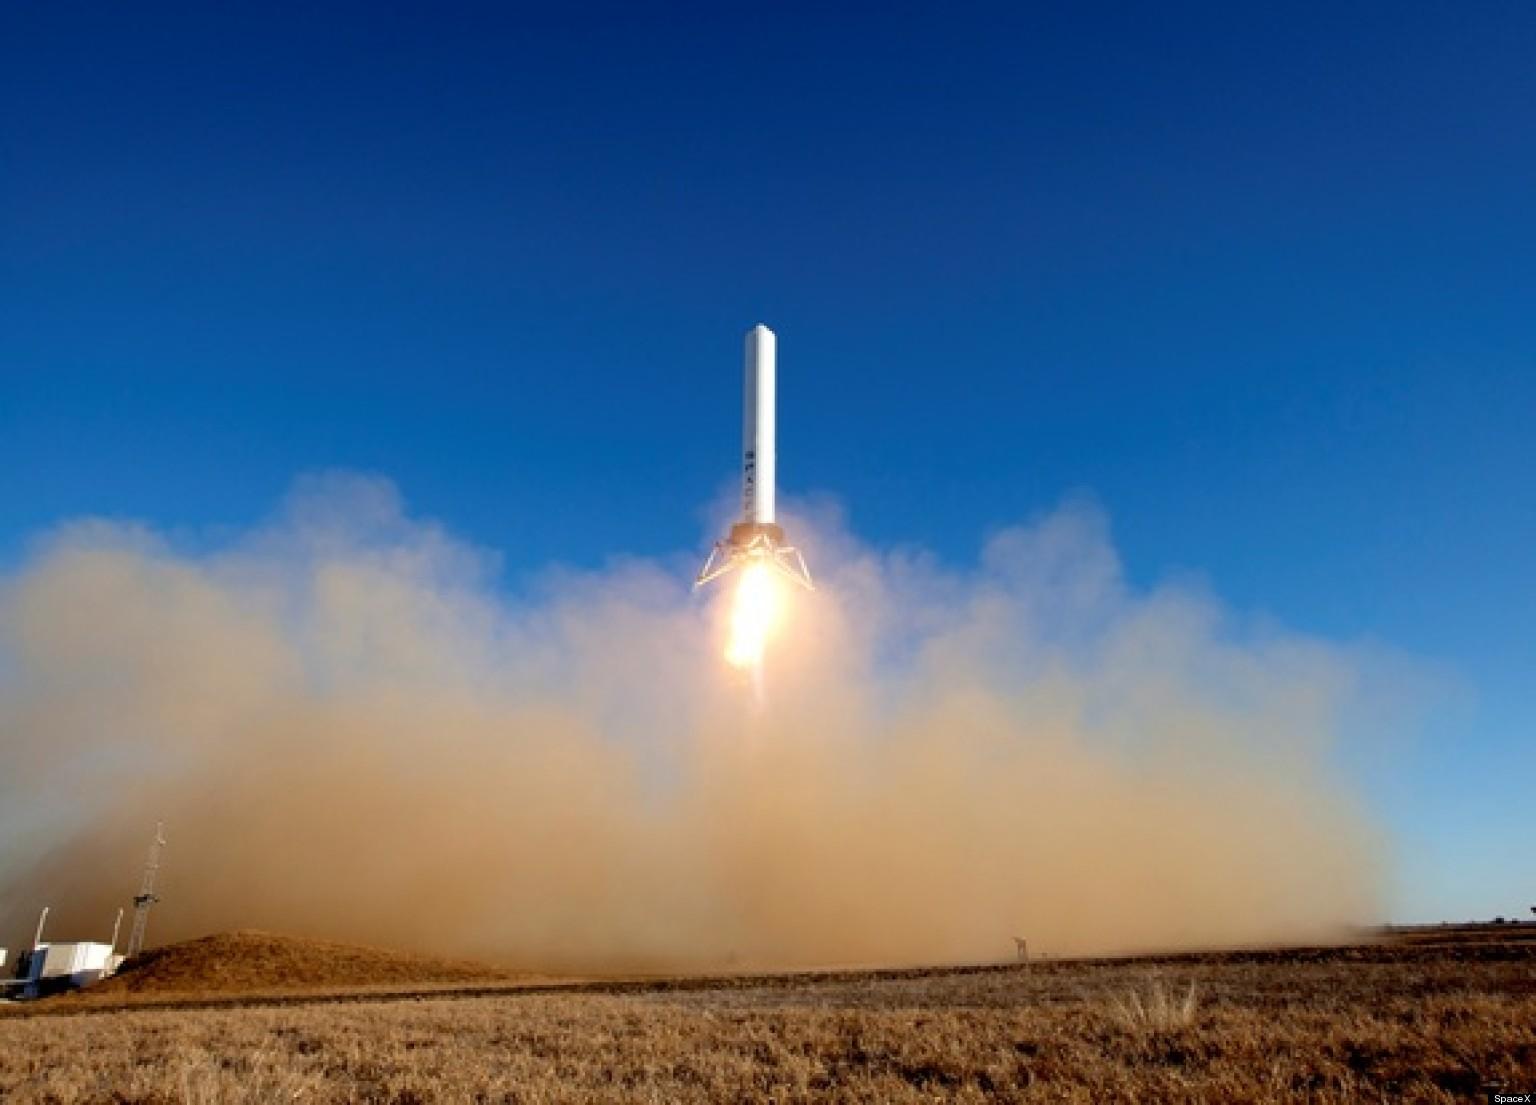 spacex rocket in flight - photo #4